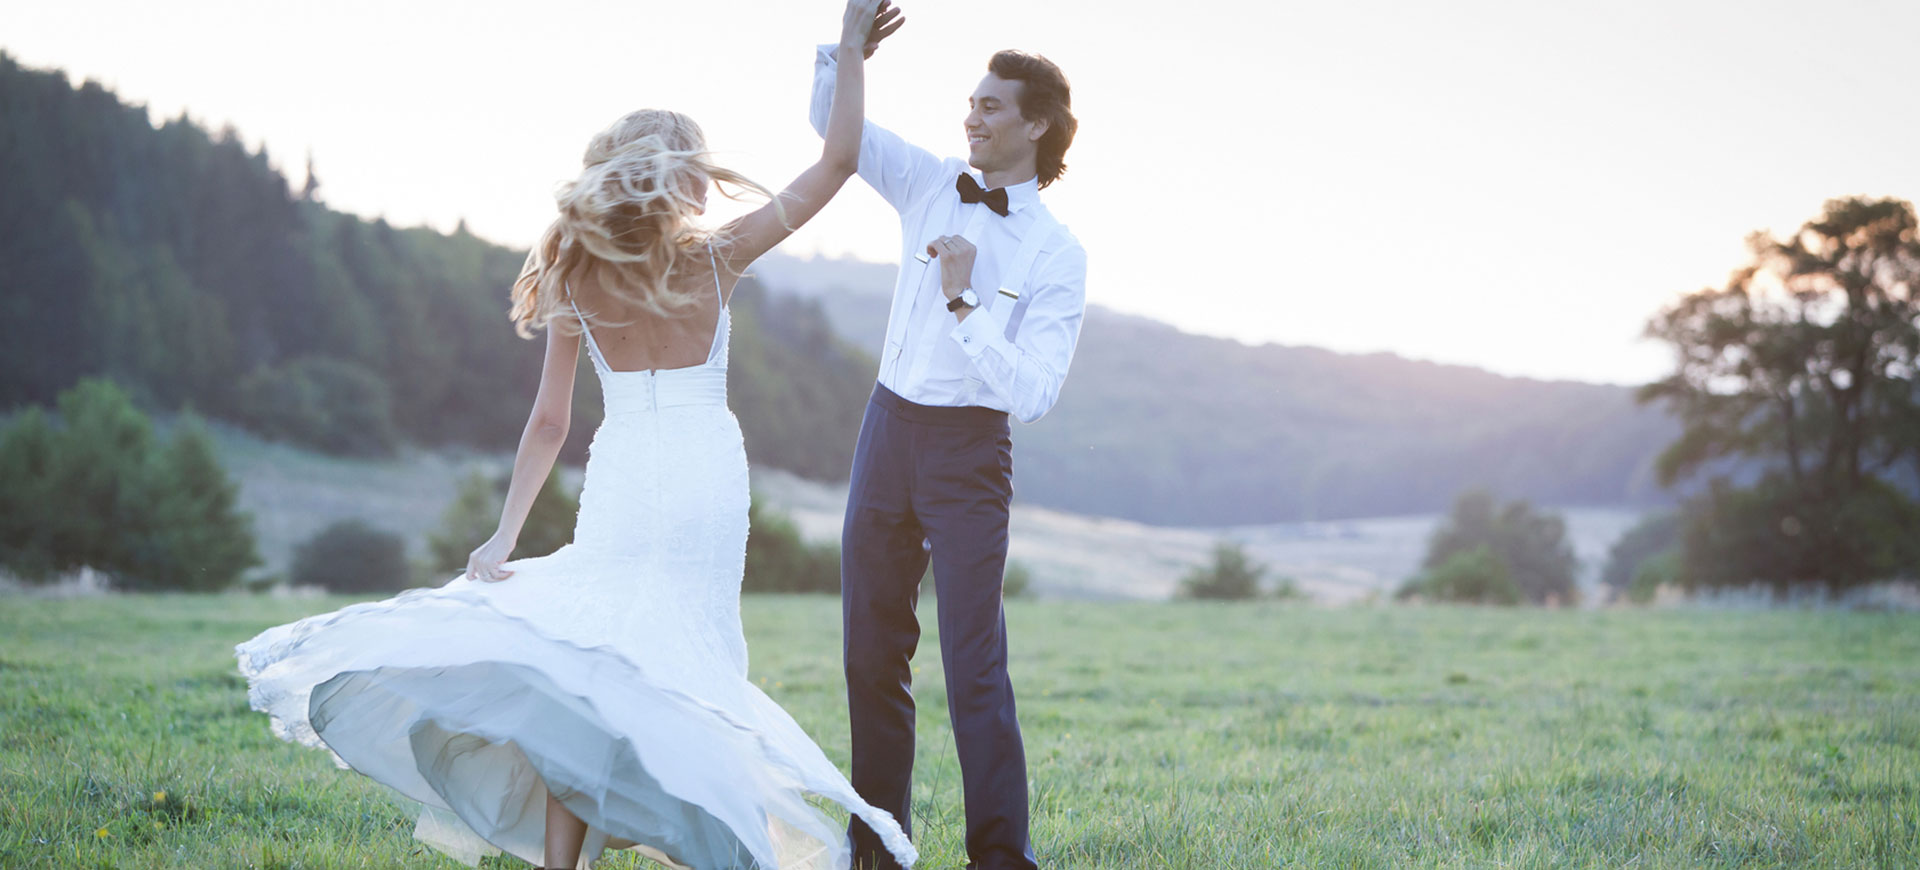 Dansande brudpar